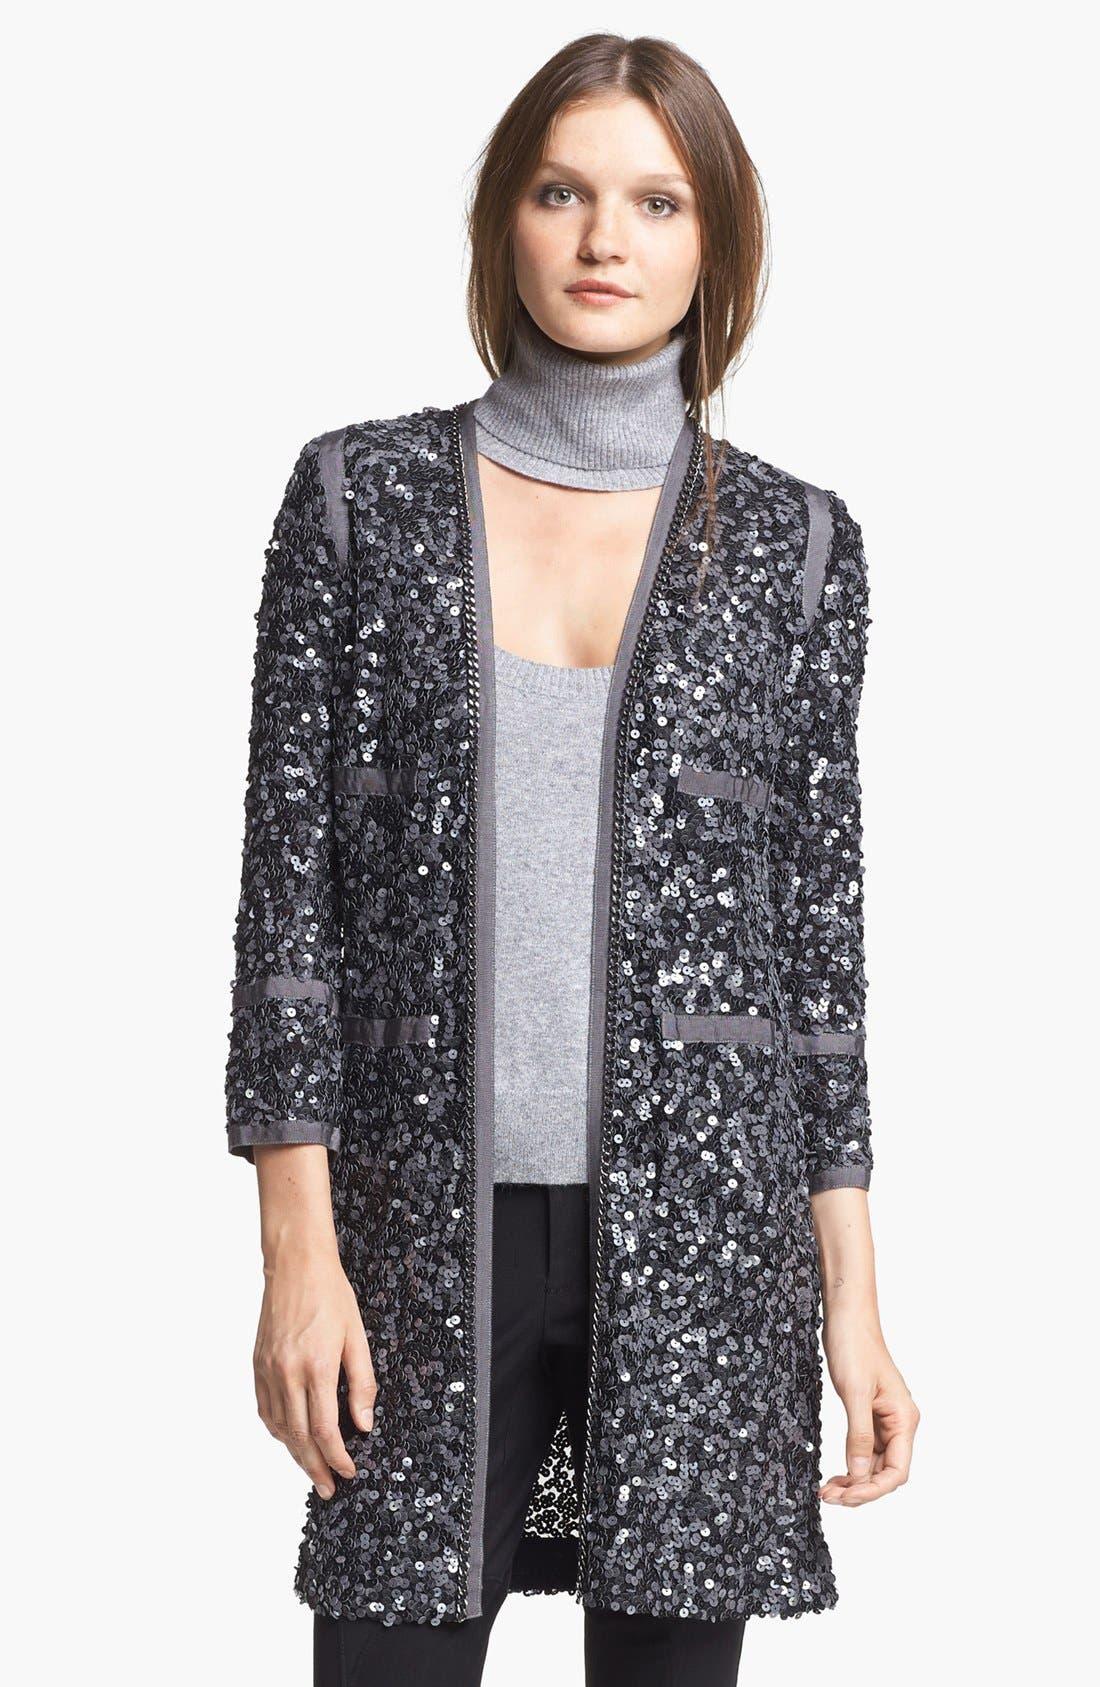 Alternate Image 1 Selected - Rachel Zoe 'Paulie' Long Sequin Jacket